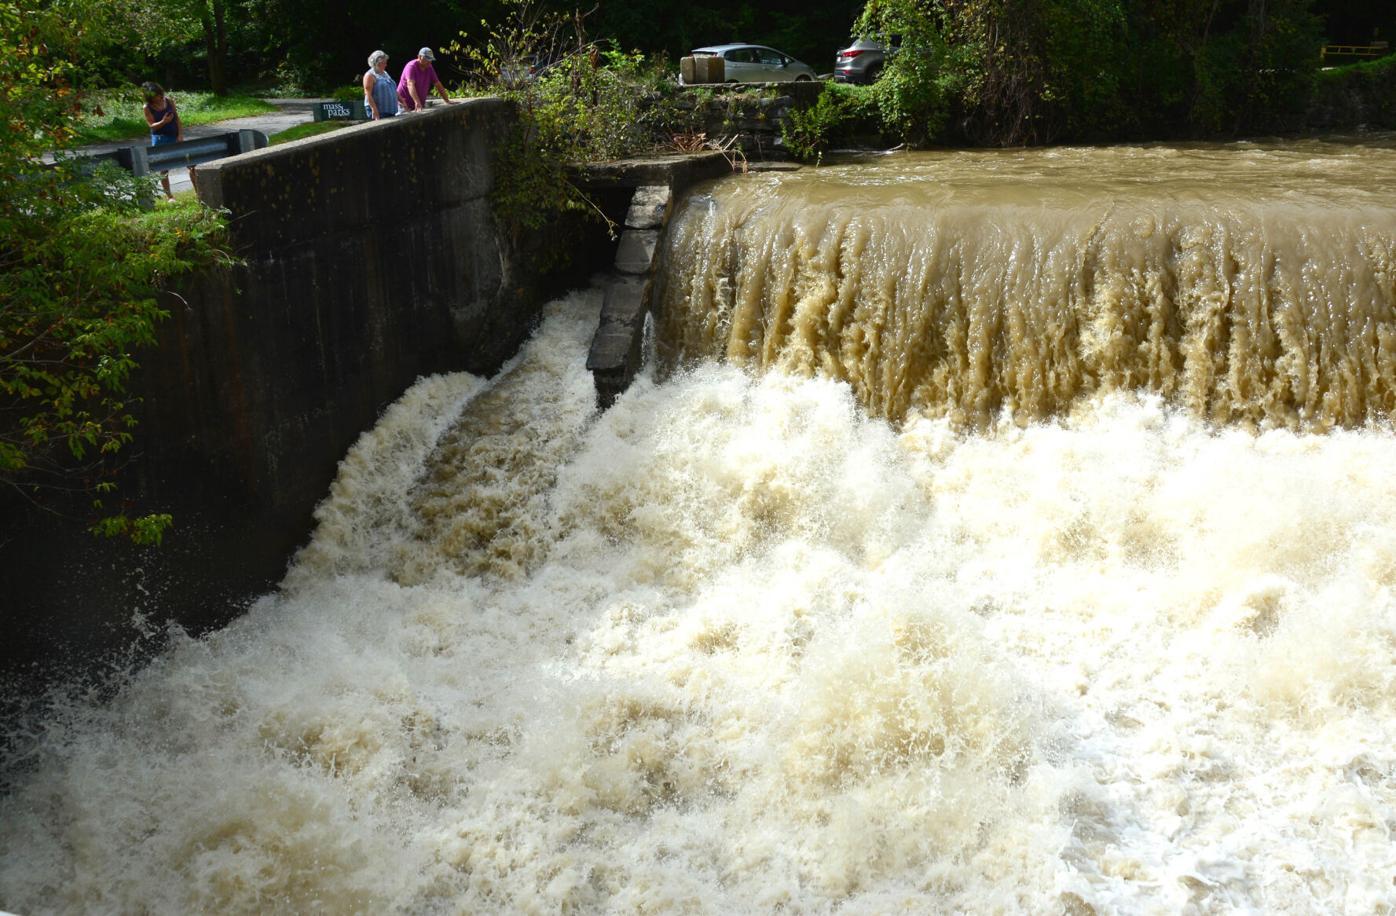 North Adams flooding